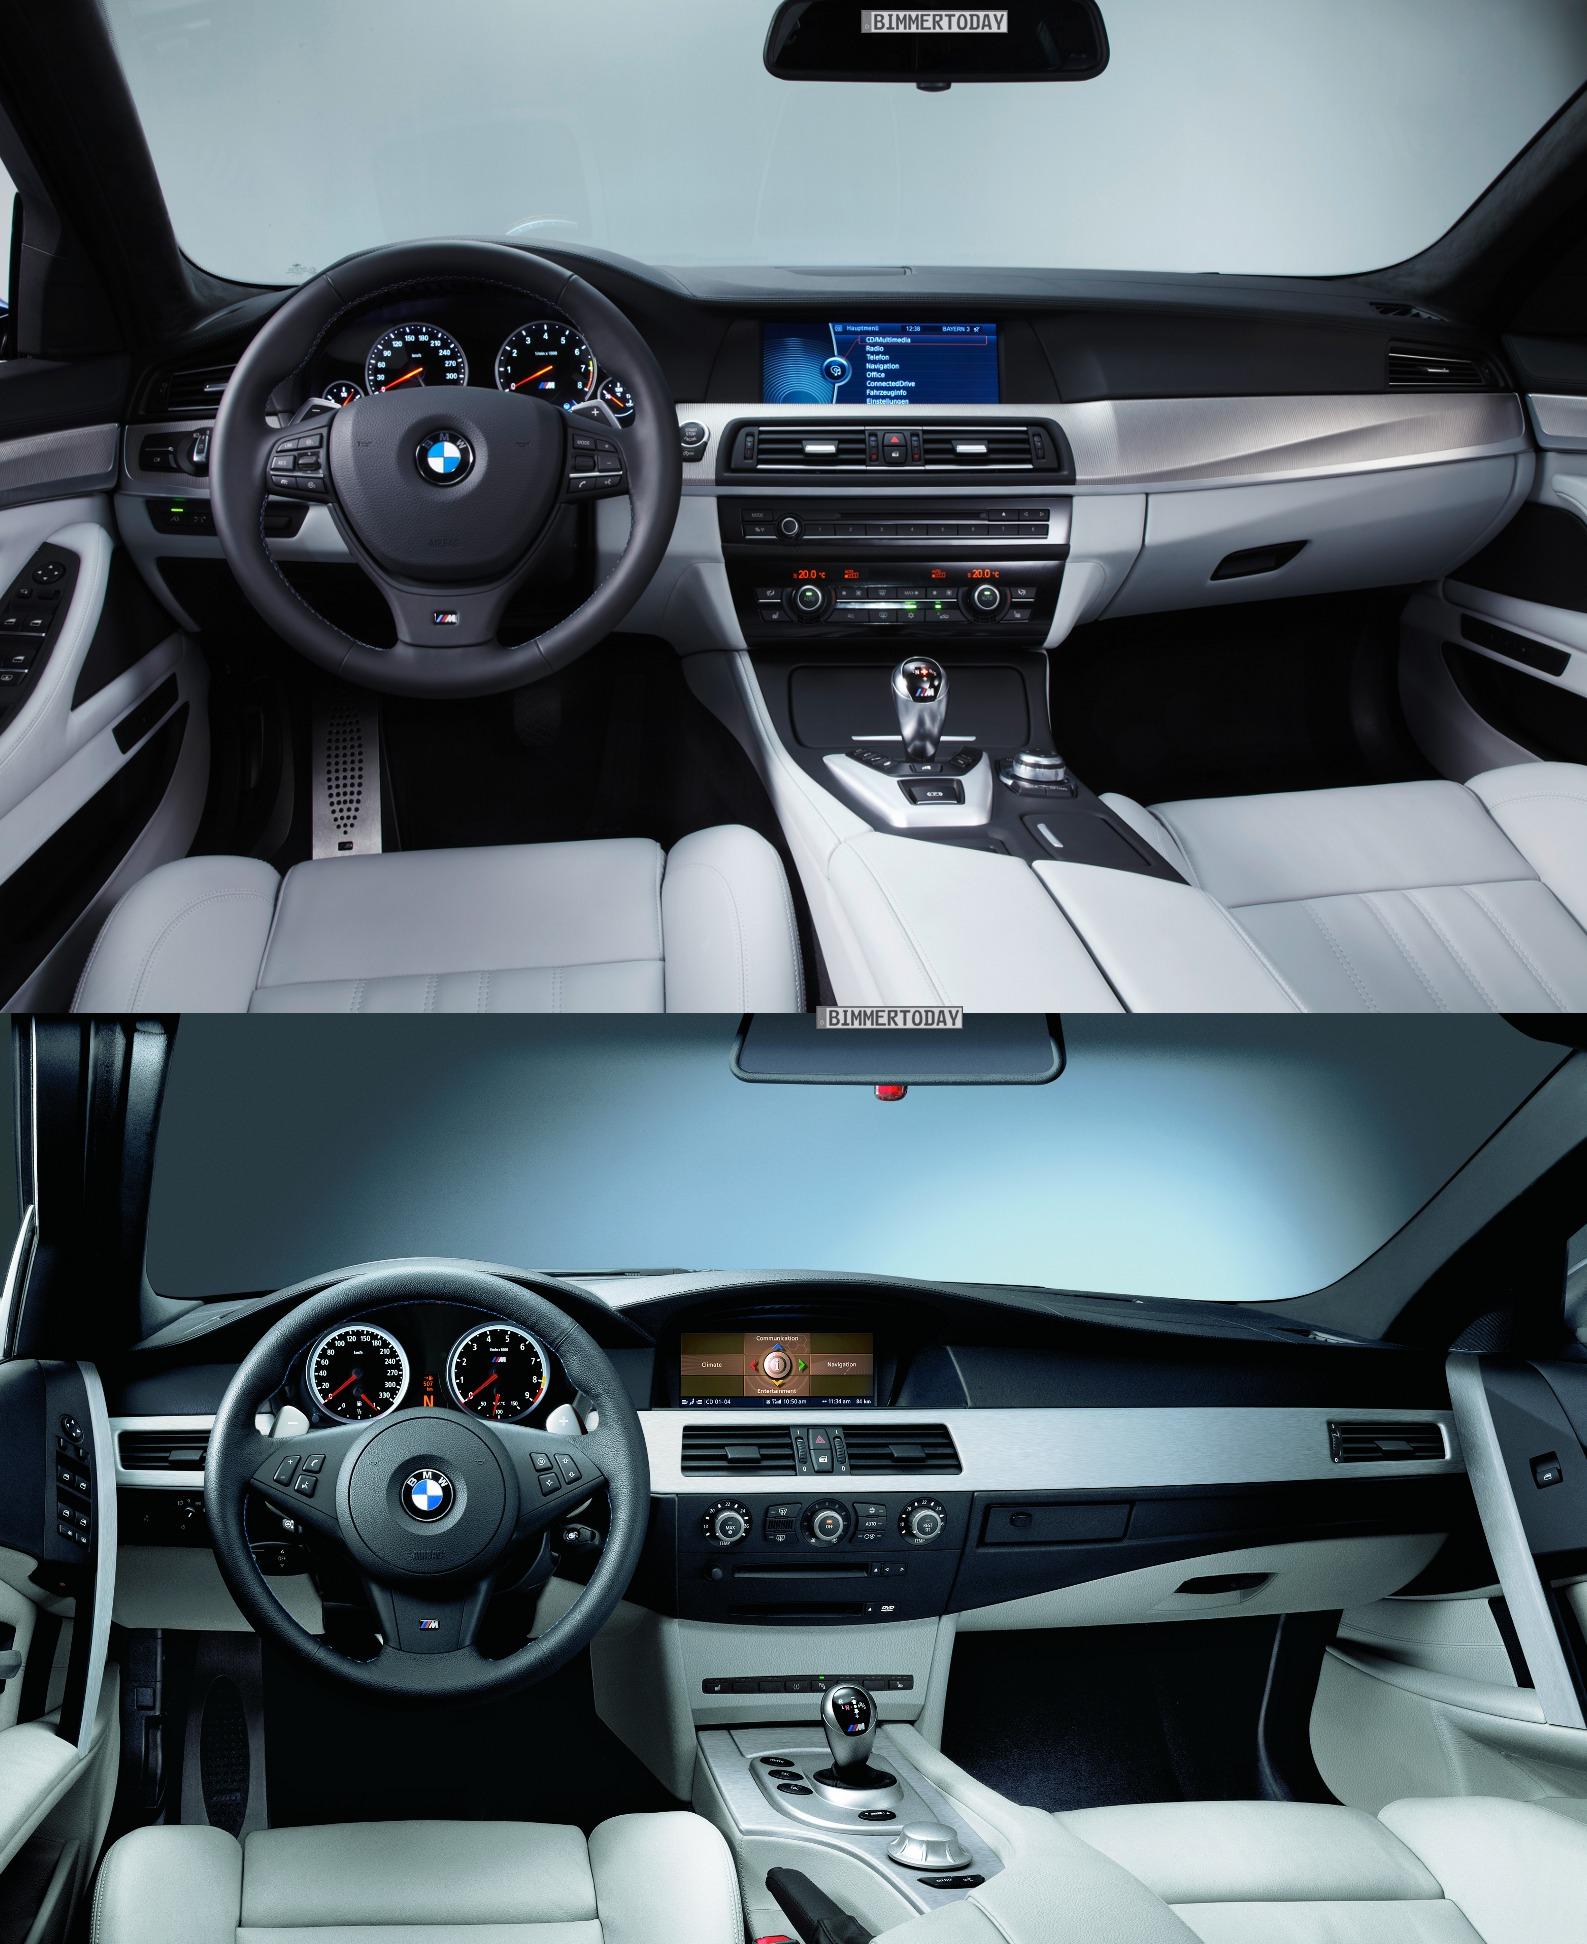 Bmw Z 8 For Sale: Photo Comparison: 2012 BMW M5 Vs. E60 M5